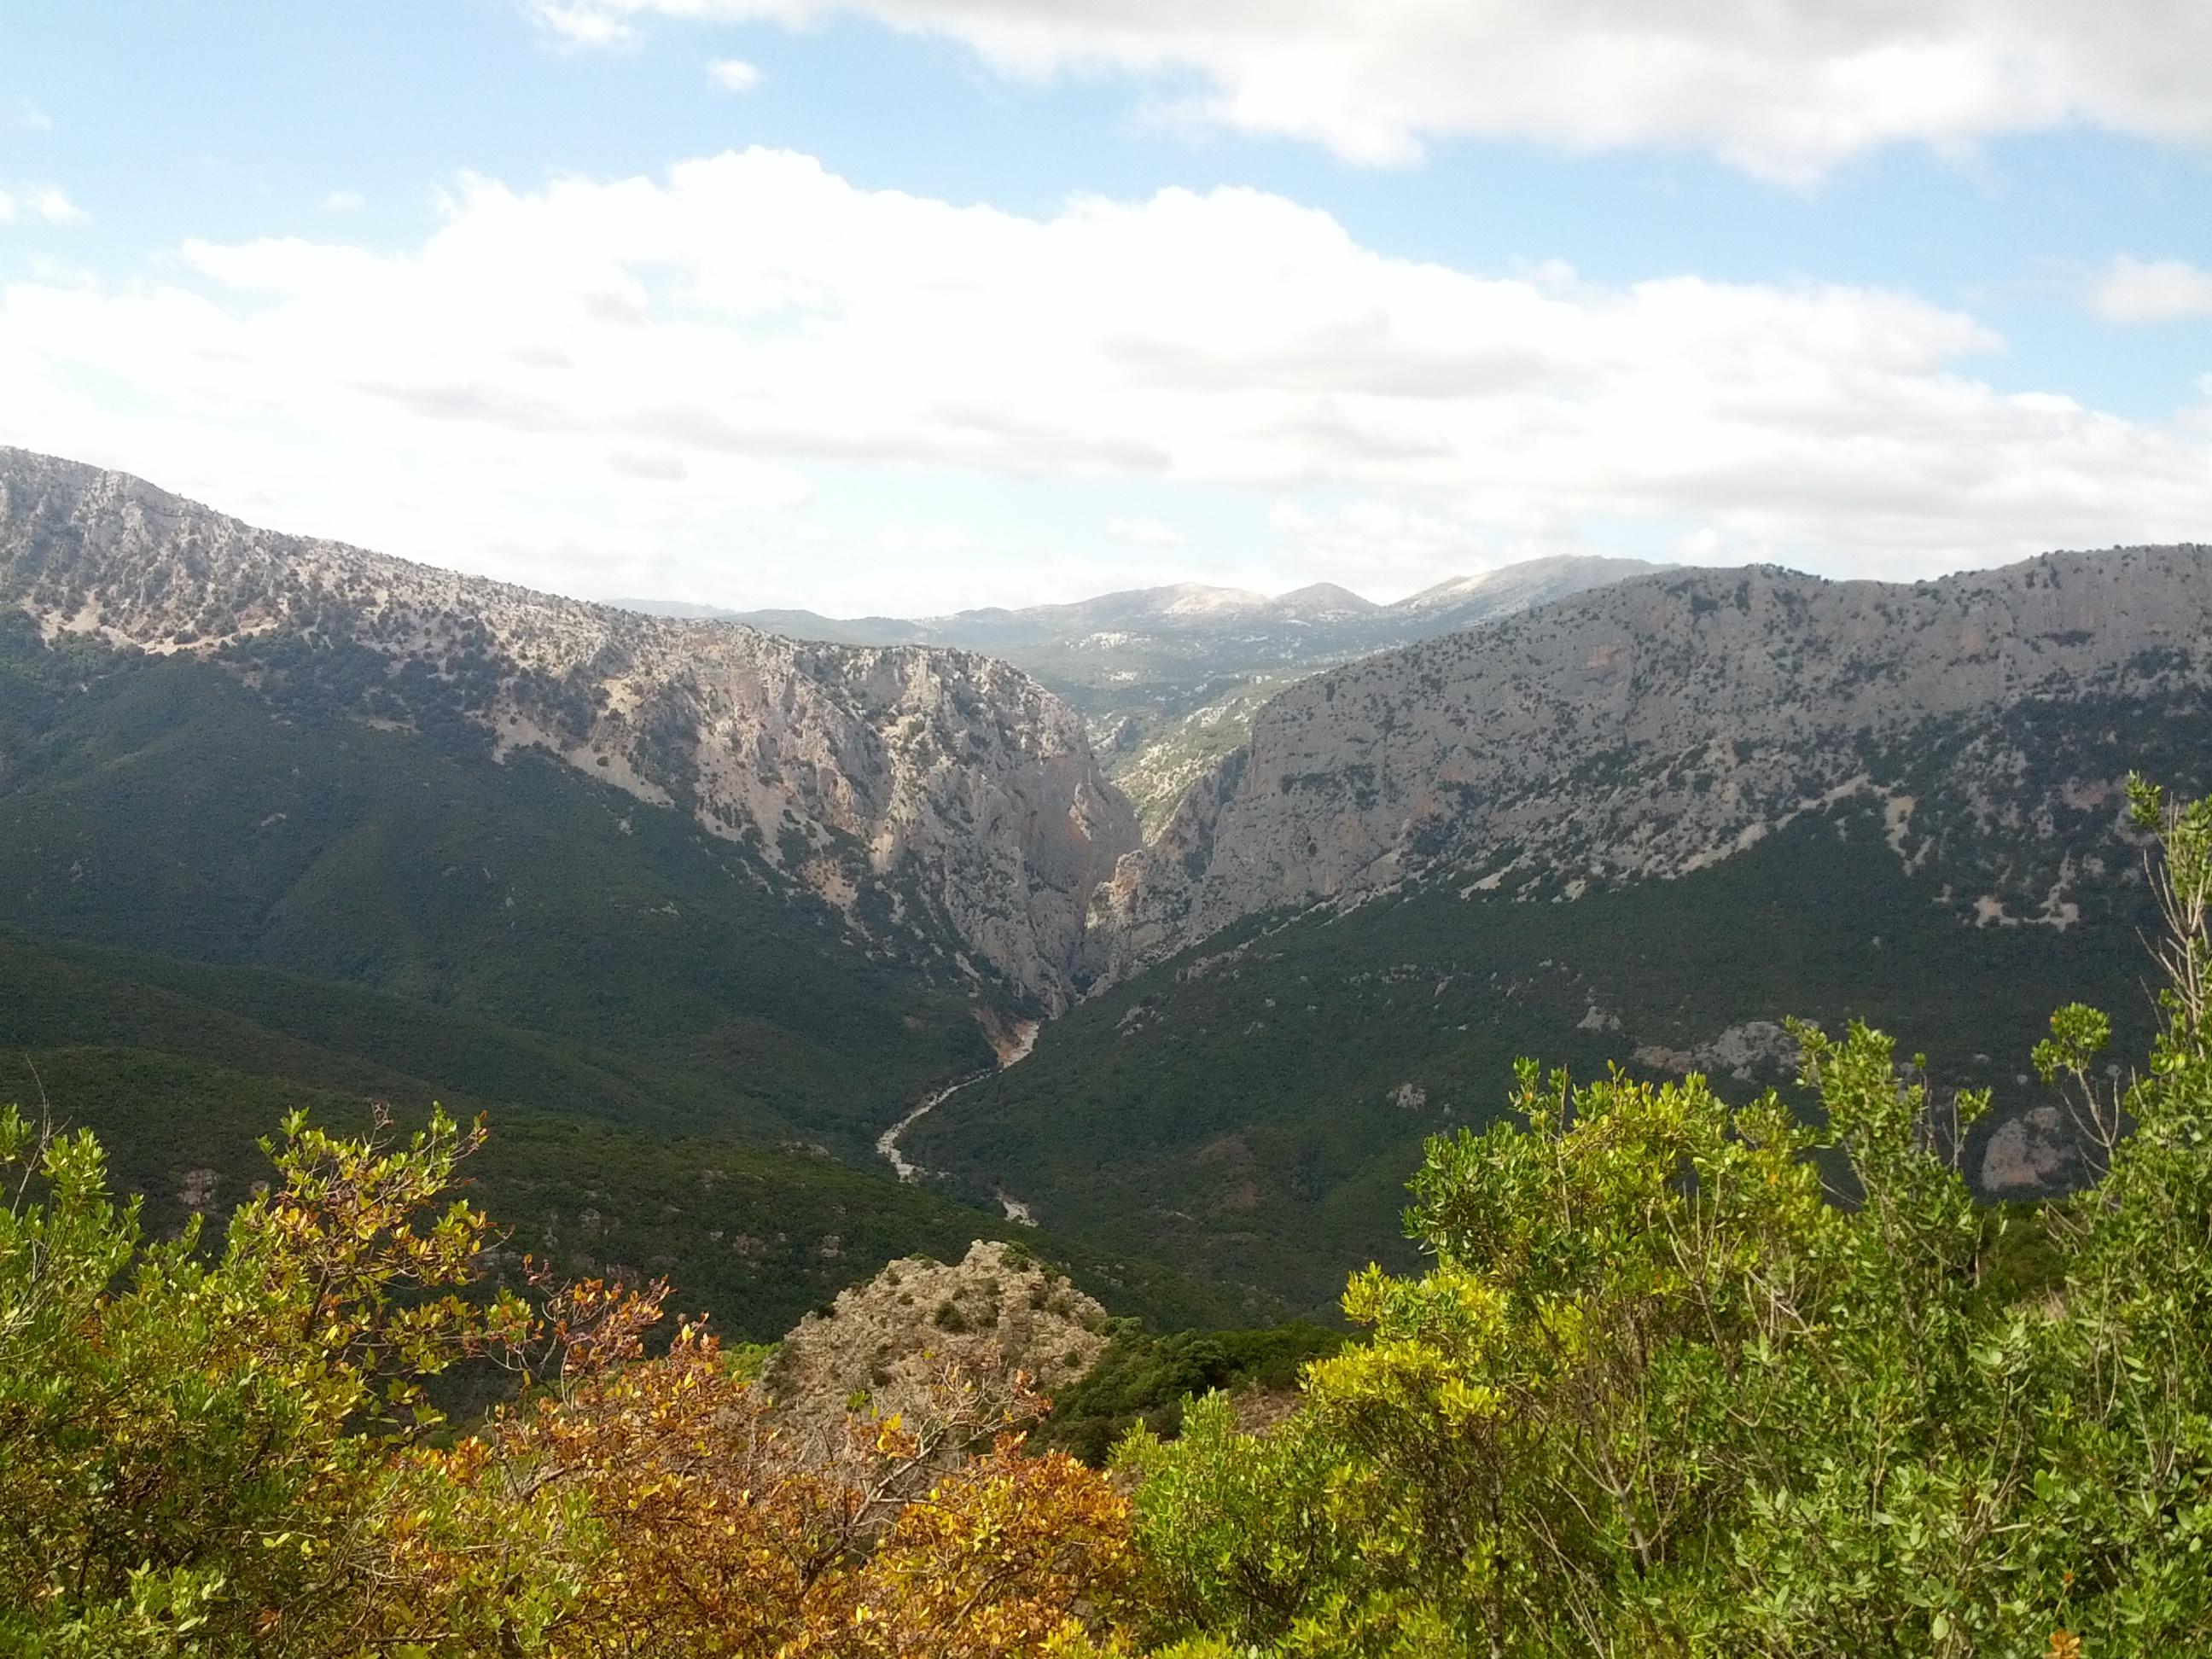 Canyon Gorropu Gorroppu, my personal trek experience